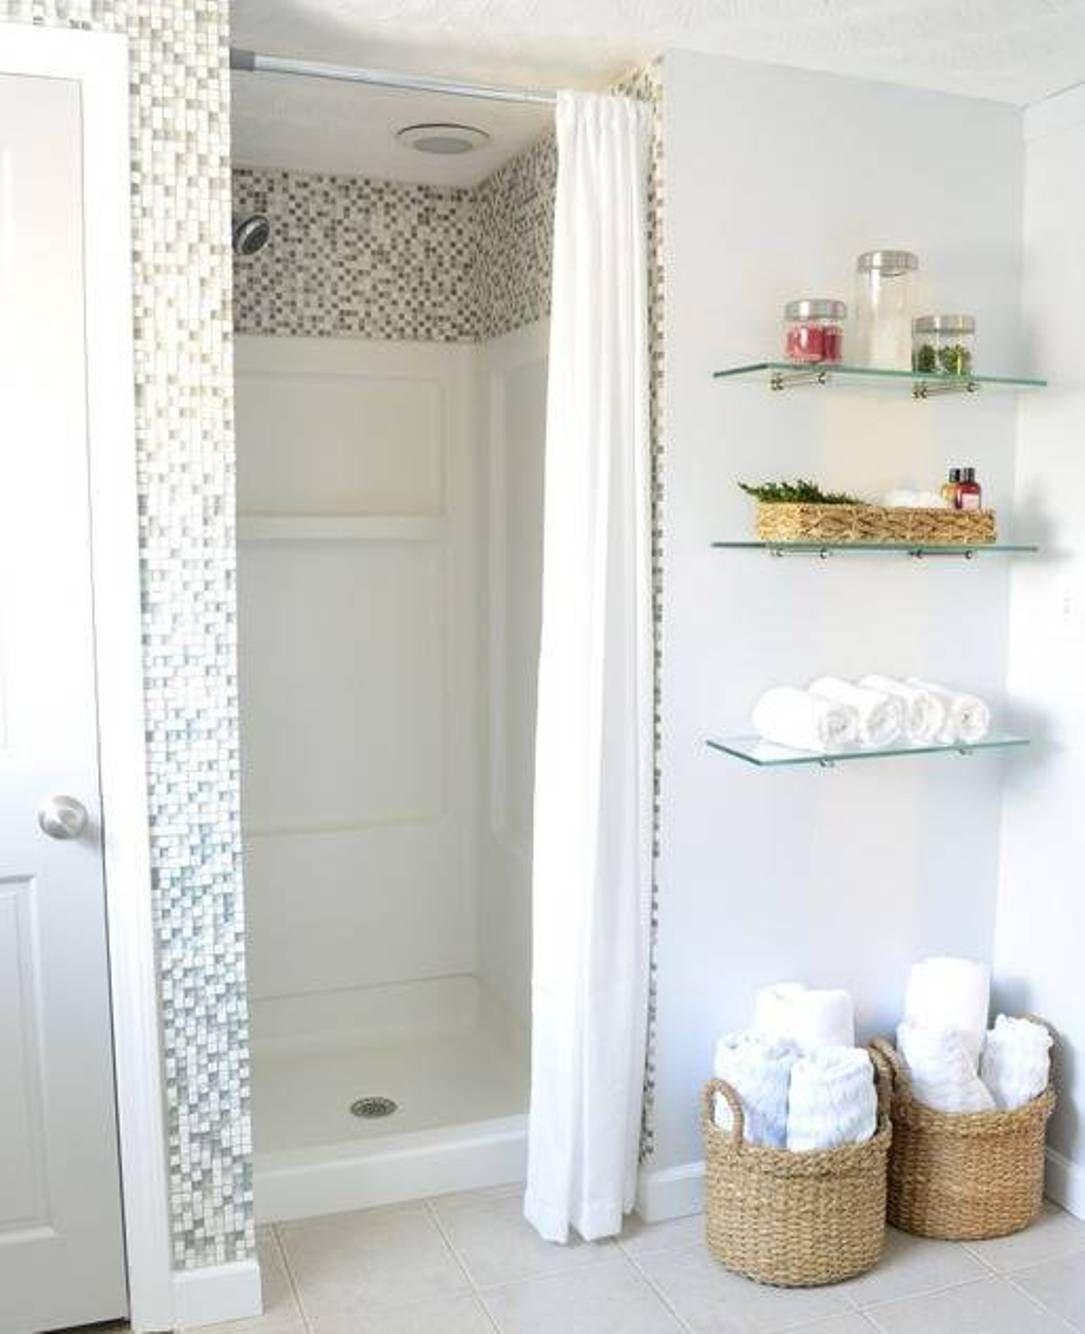 Bathroom bathroom fiberglass shower stalls small